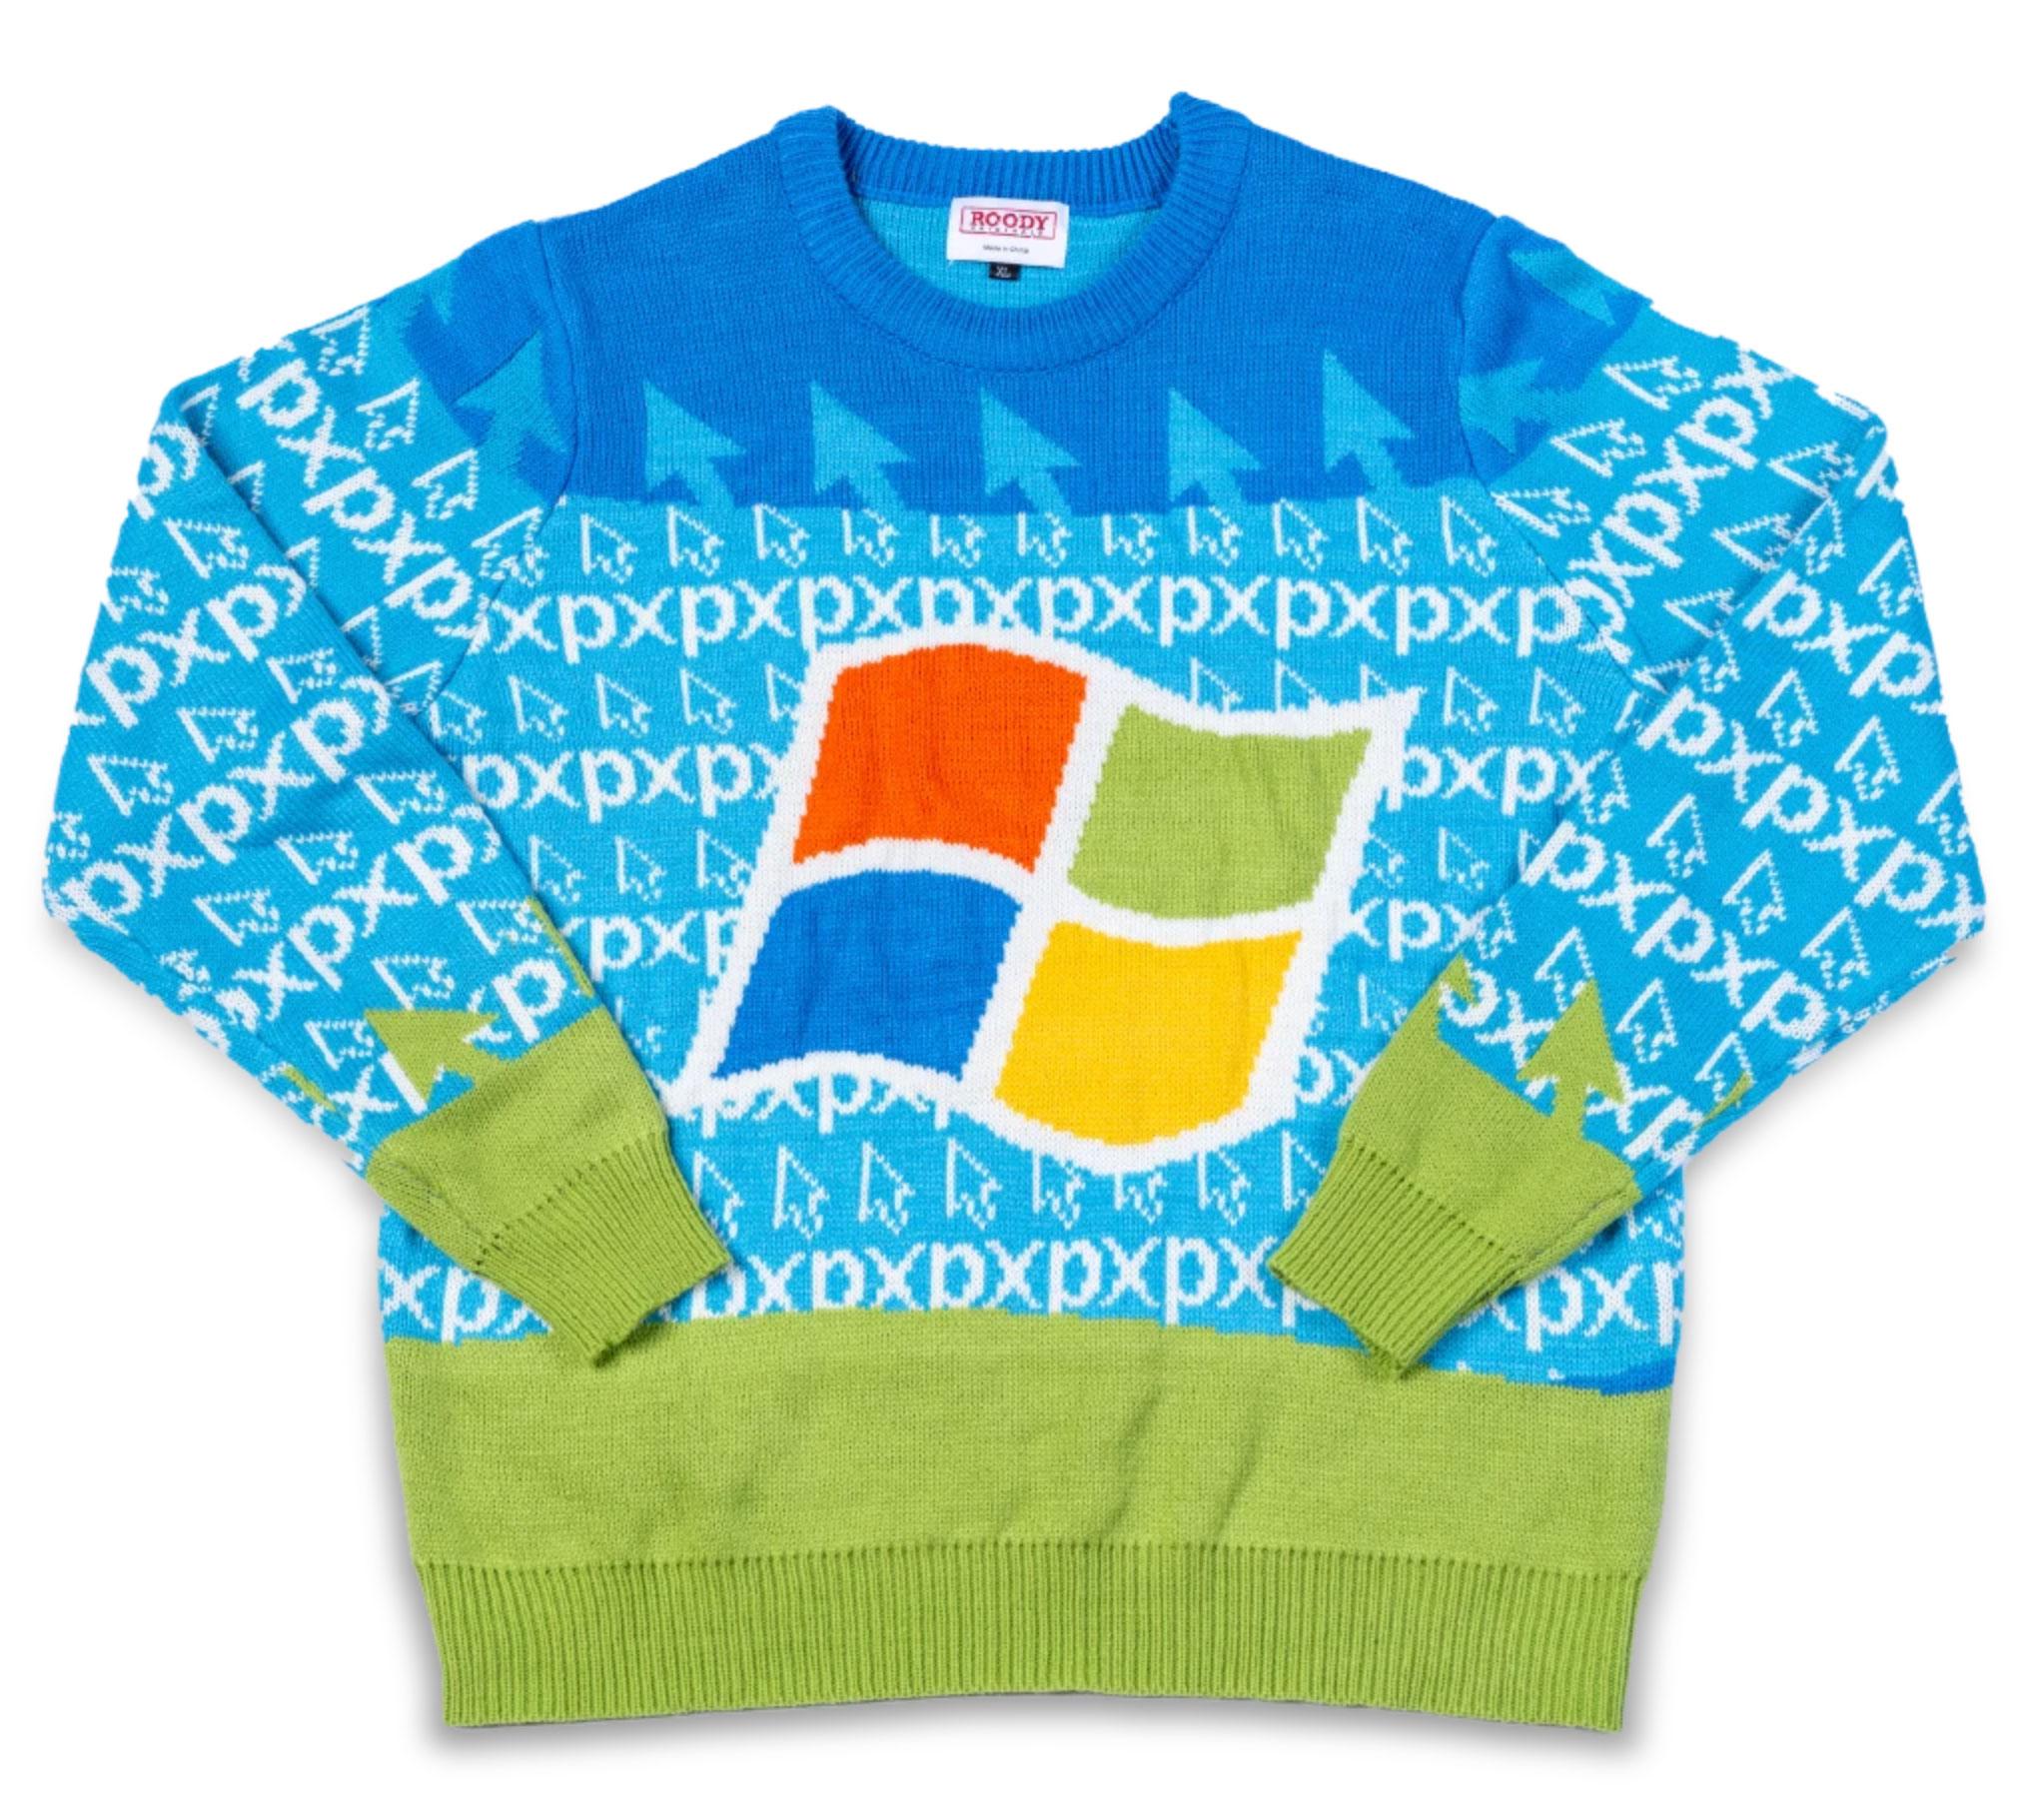 windows 95 ugly sweater